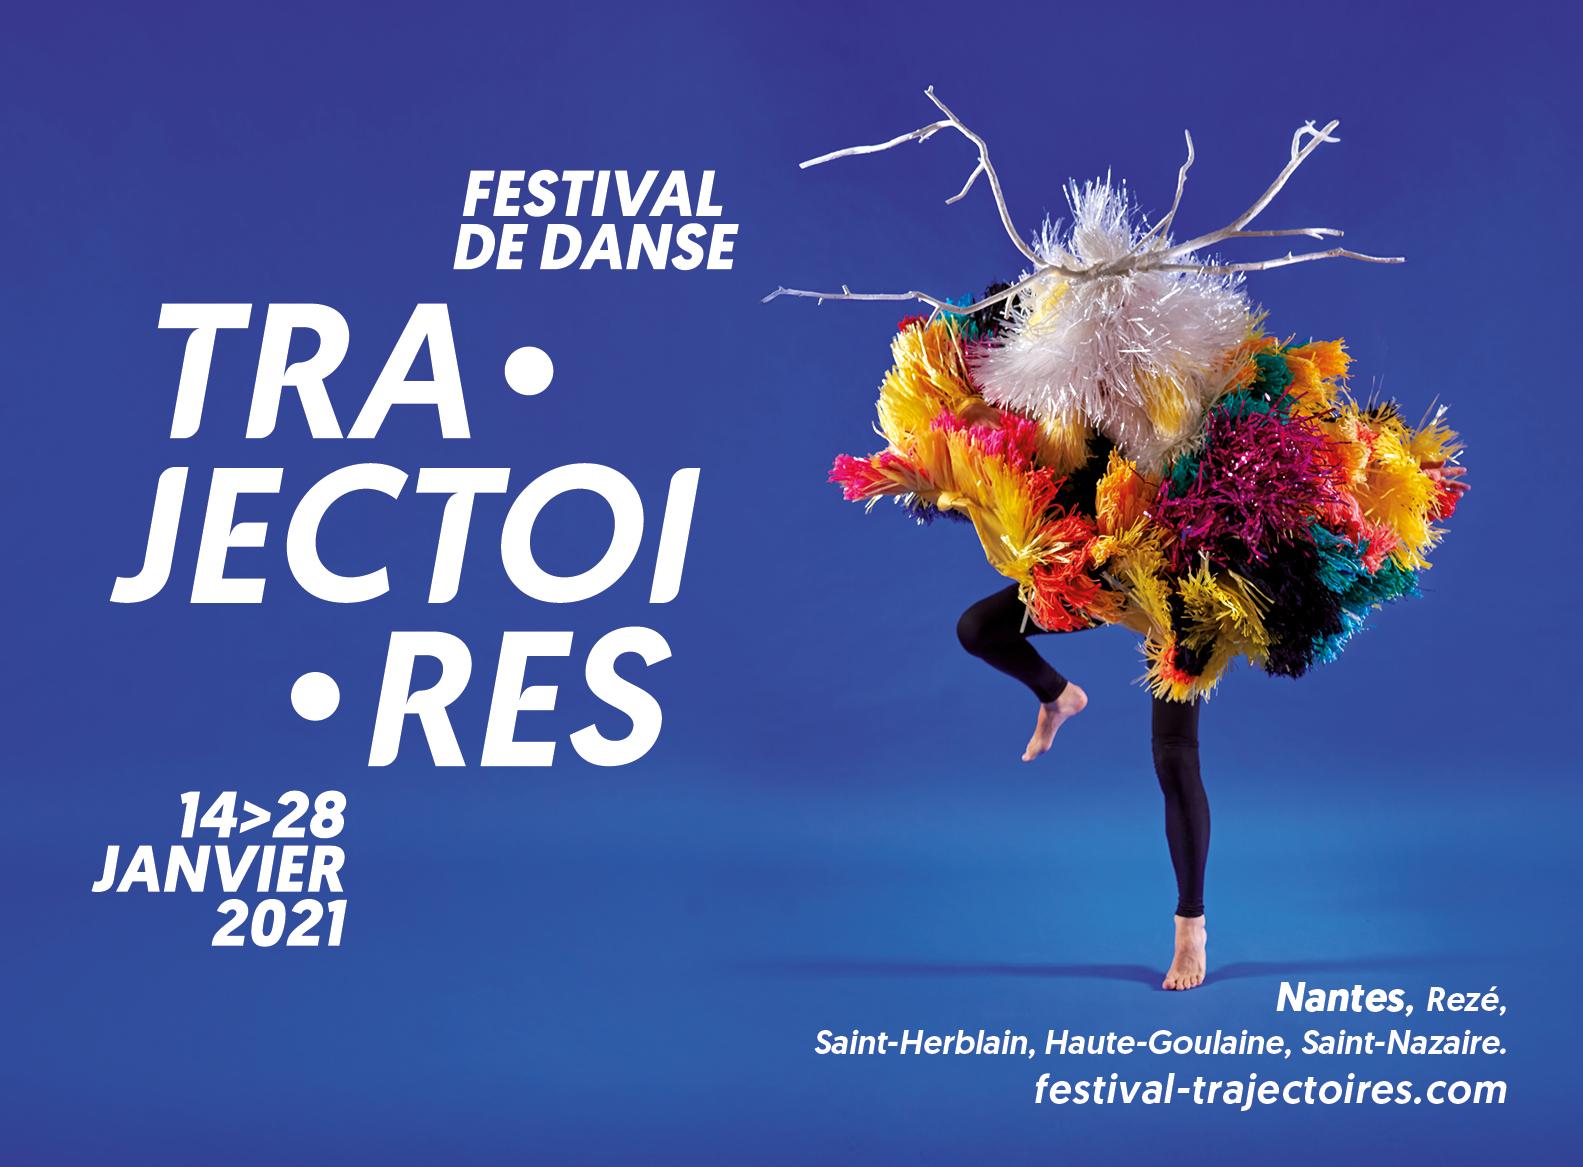 Affiche festival de danse fond bleu